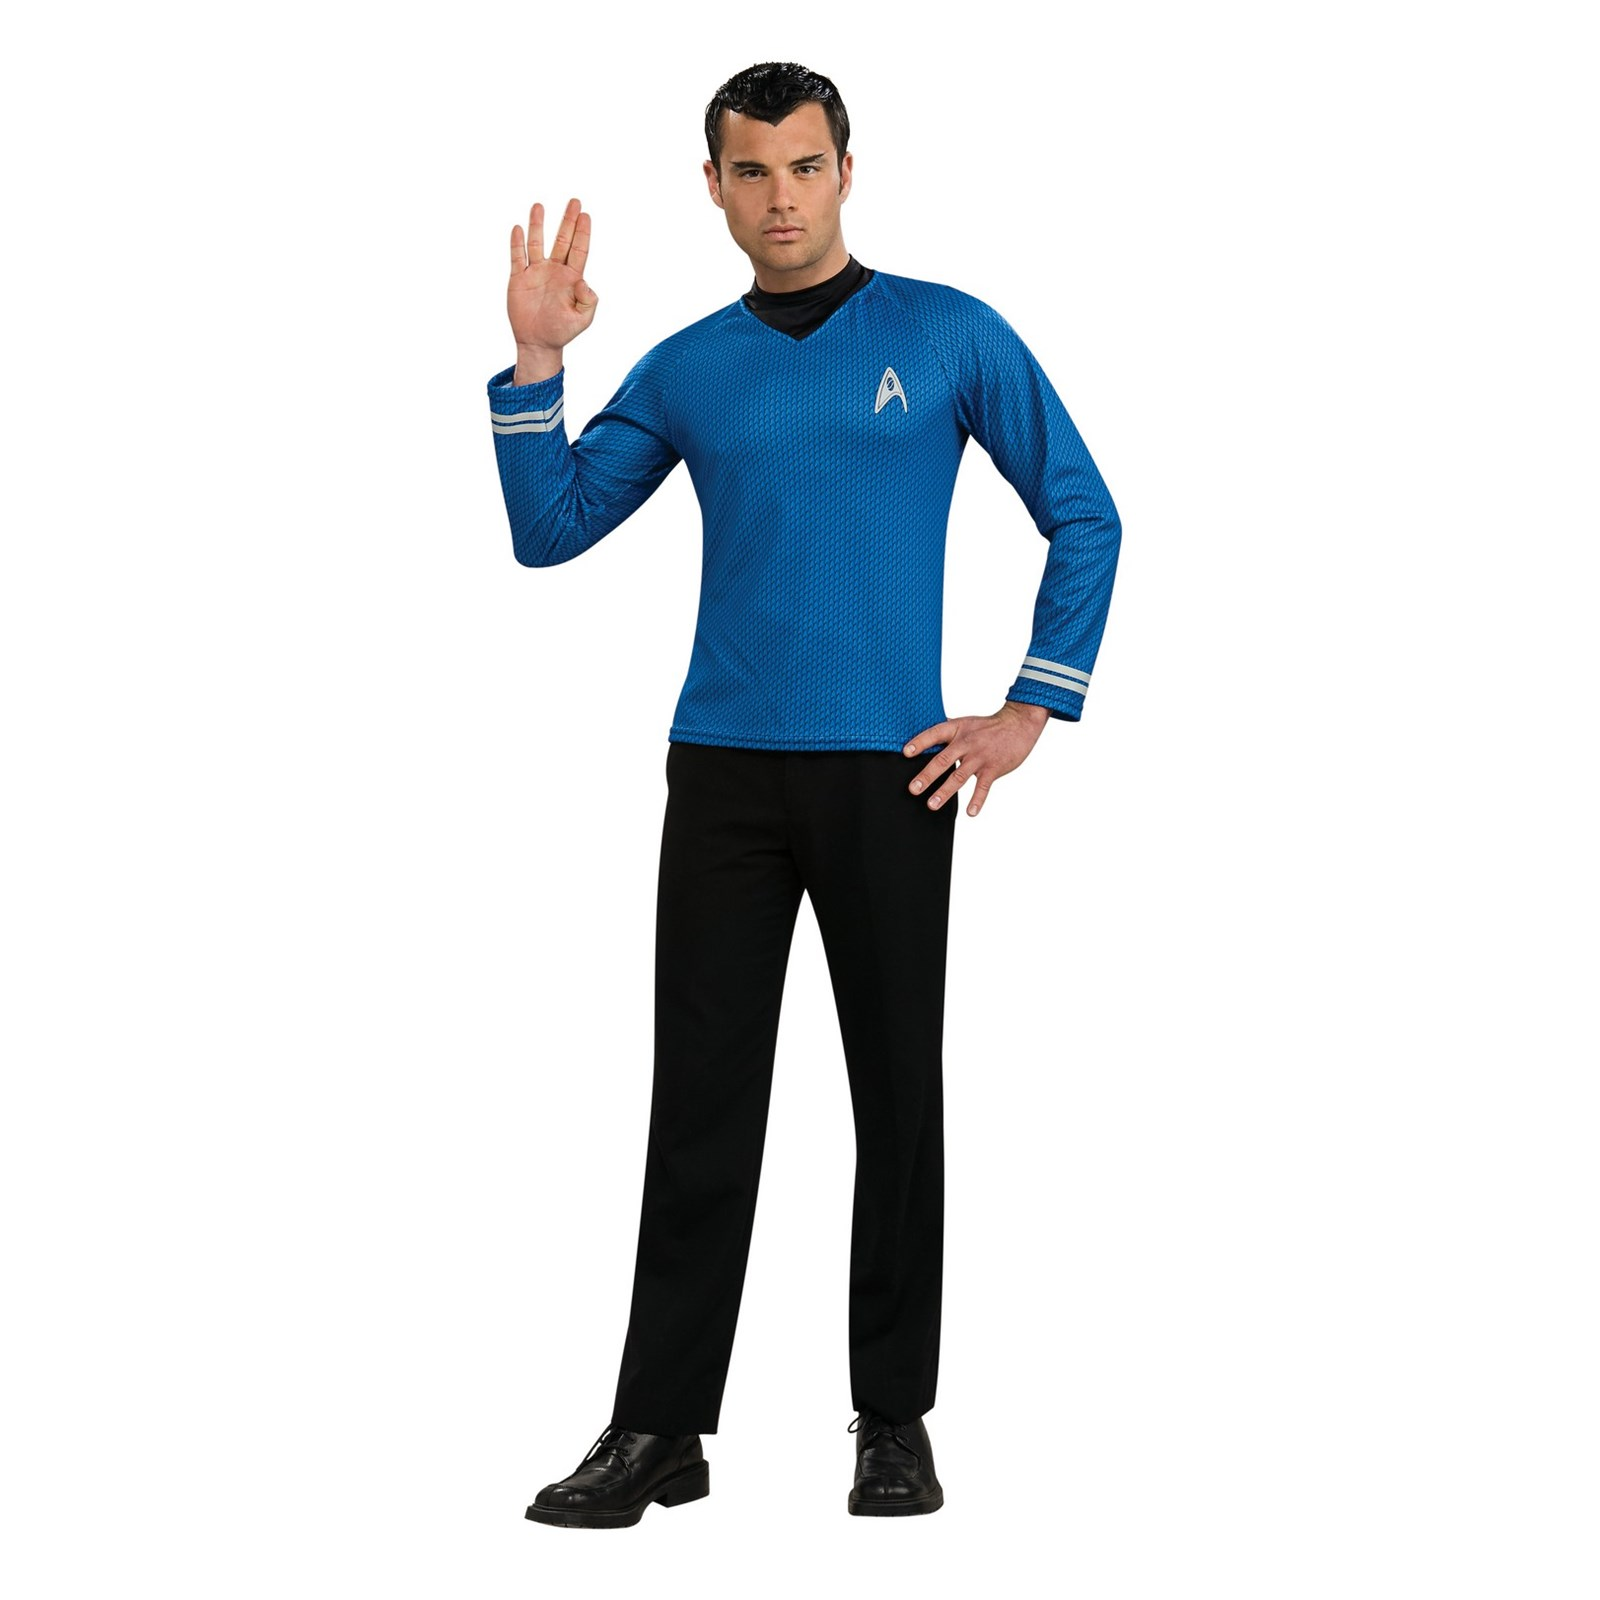 Star Trek Costumes | BuyCostumes.com